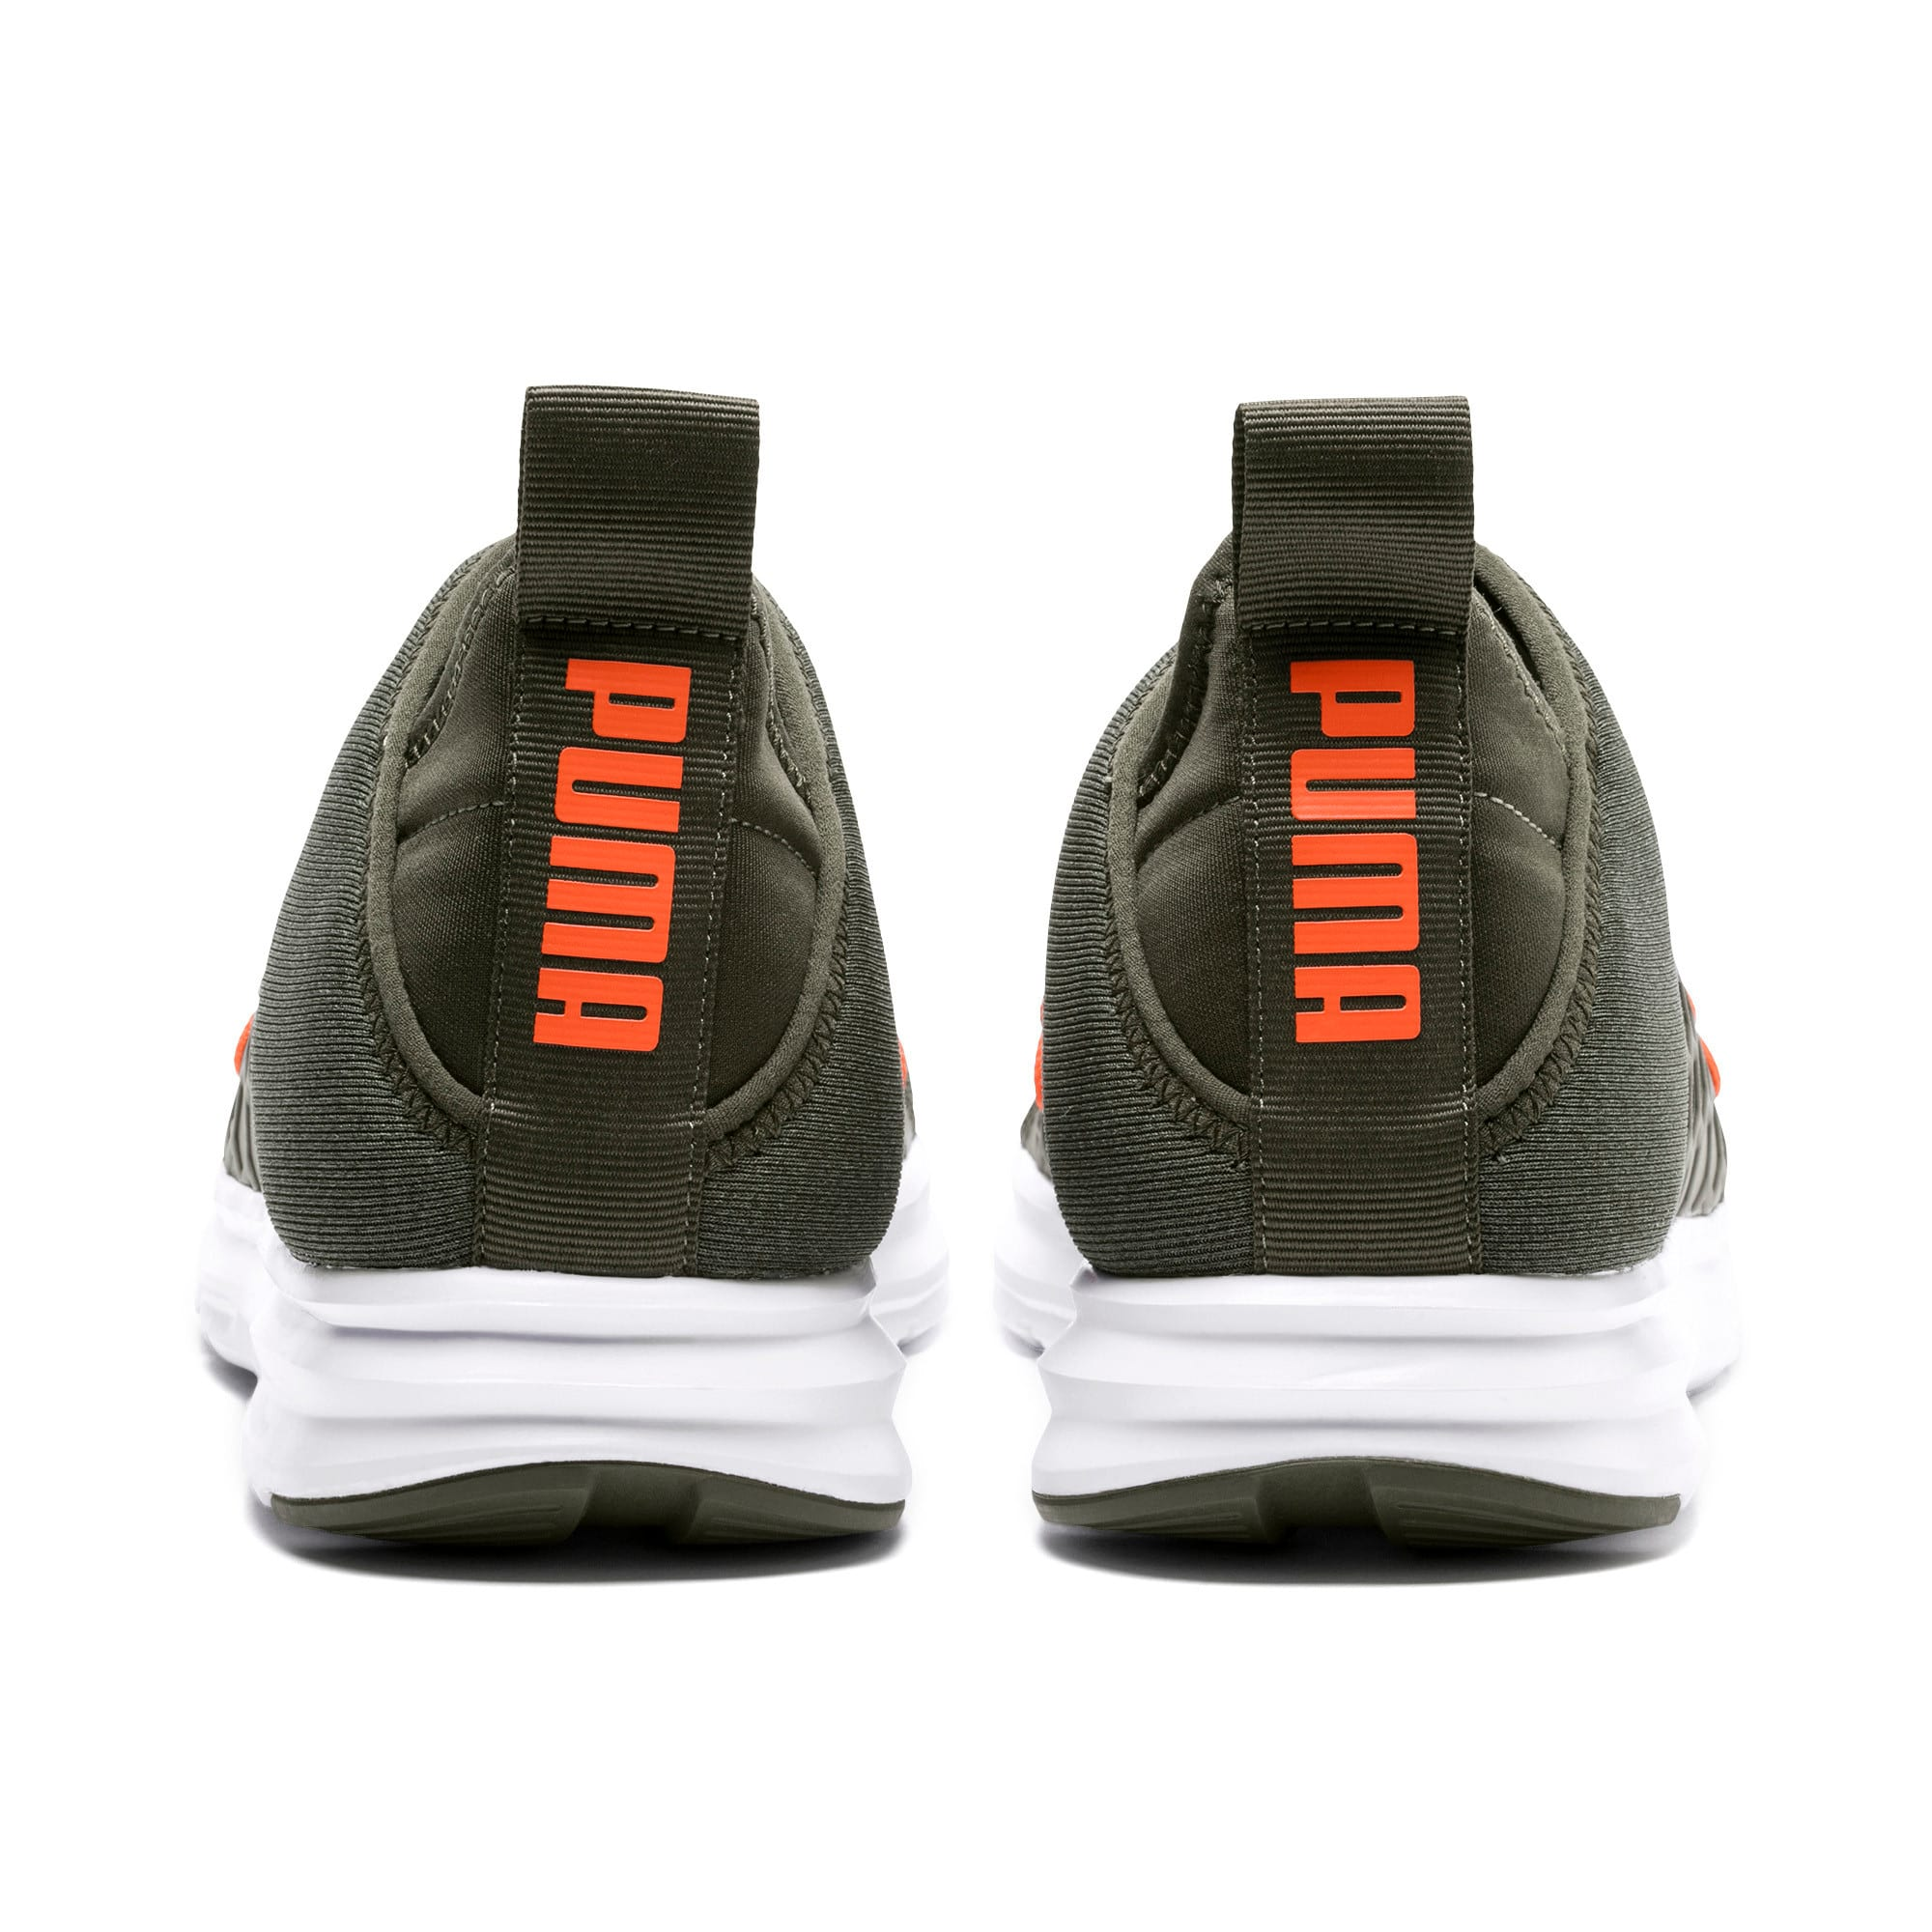 Thumbnail 3 of Enzo NETFIT Mid Men's Training Shoes, Forest Night-Firecracker, medium-IND